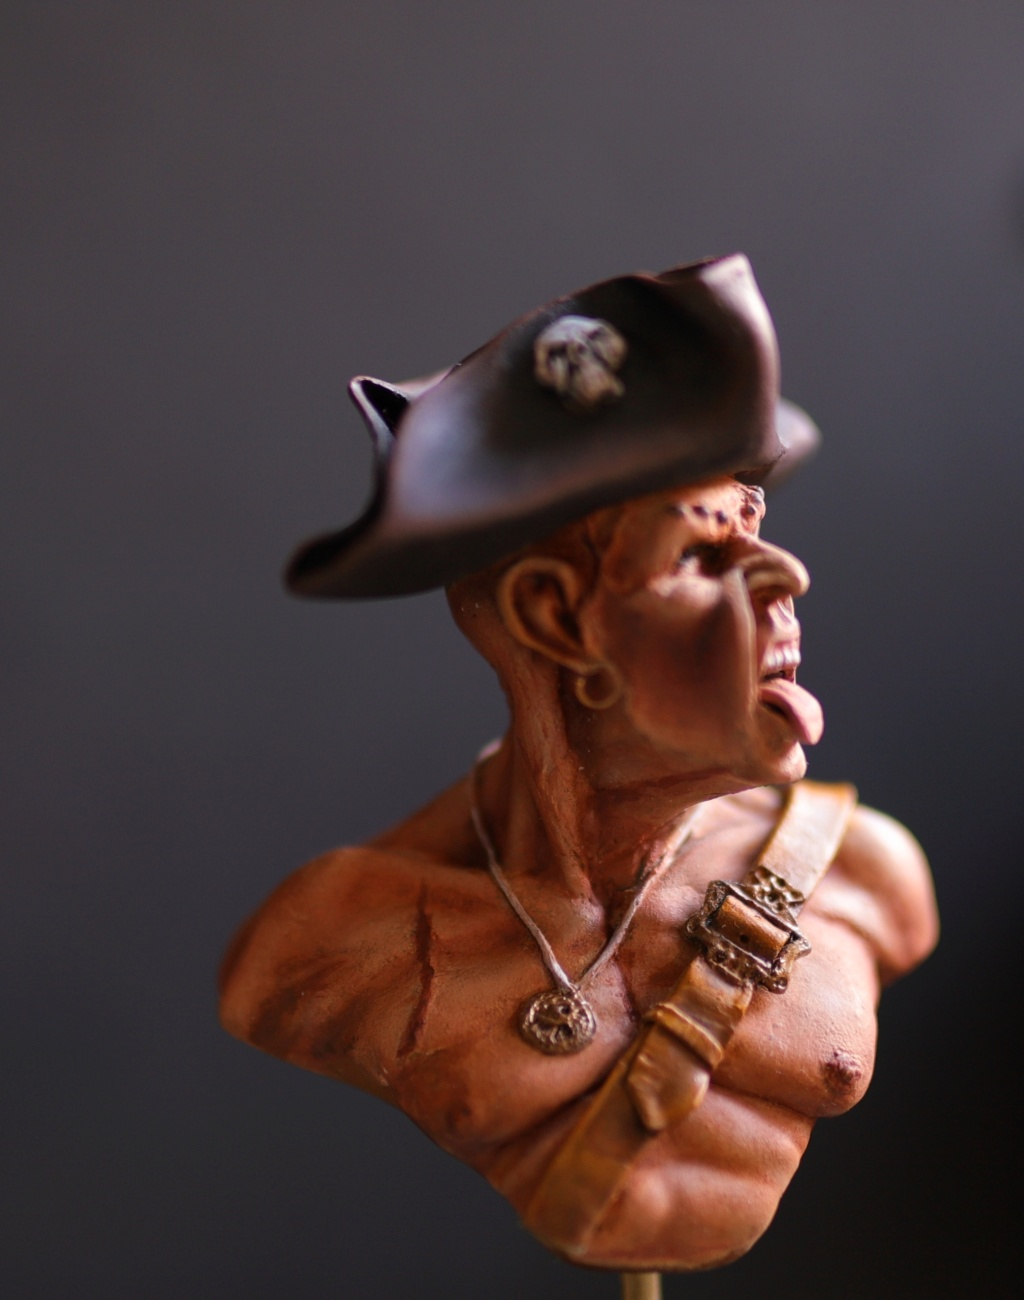 Pirate des caraïbes - Définitif Pirate17